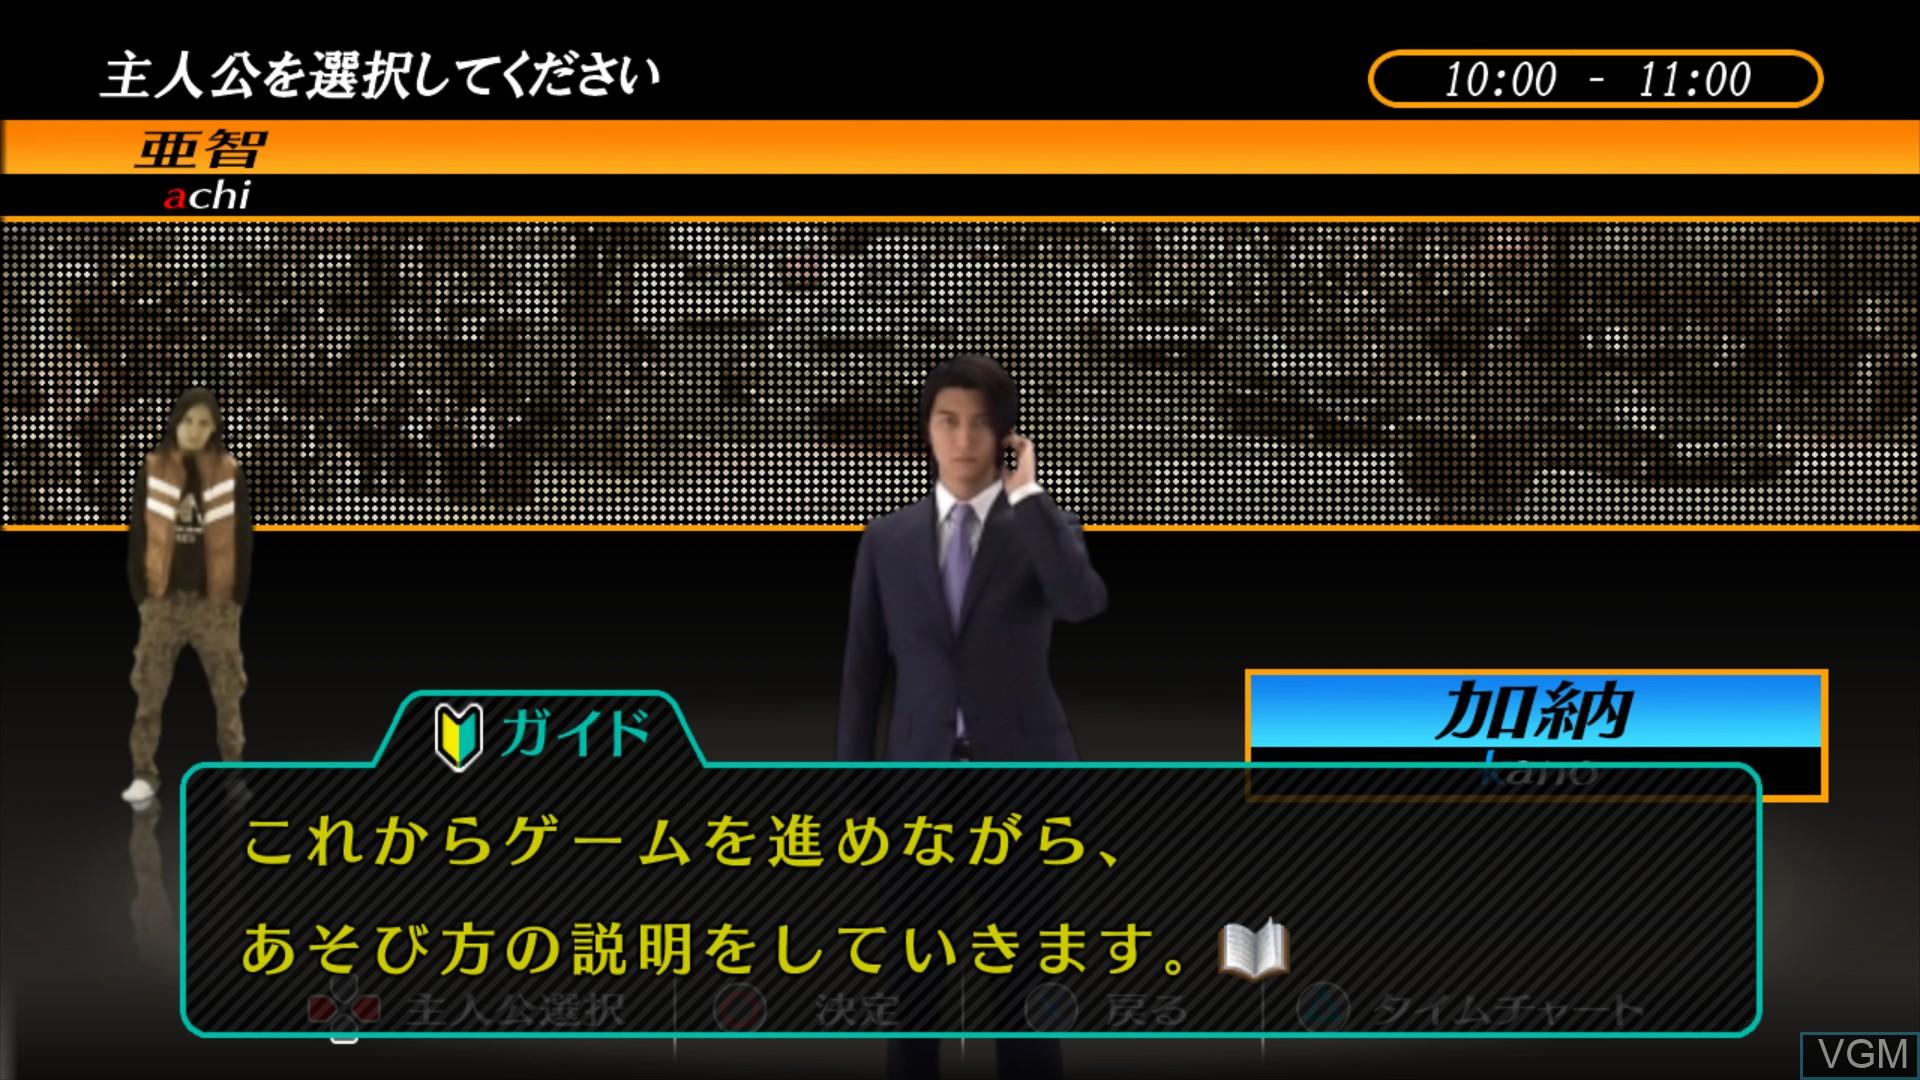 Image du menu du jeu 428 - Fuusa Sareta Shibuya de sur Sony Playstation 3